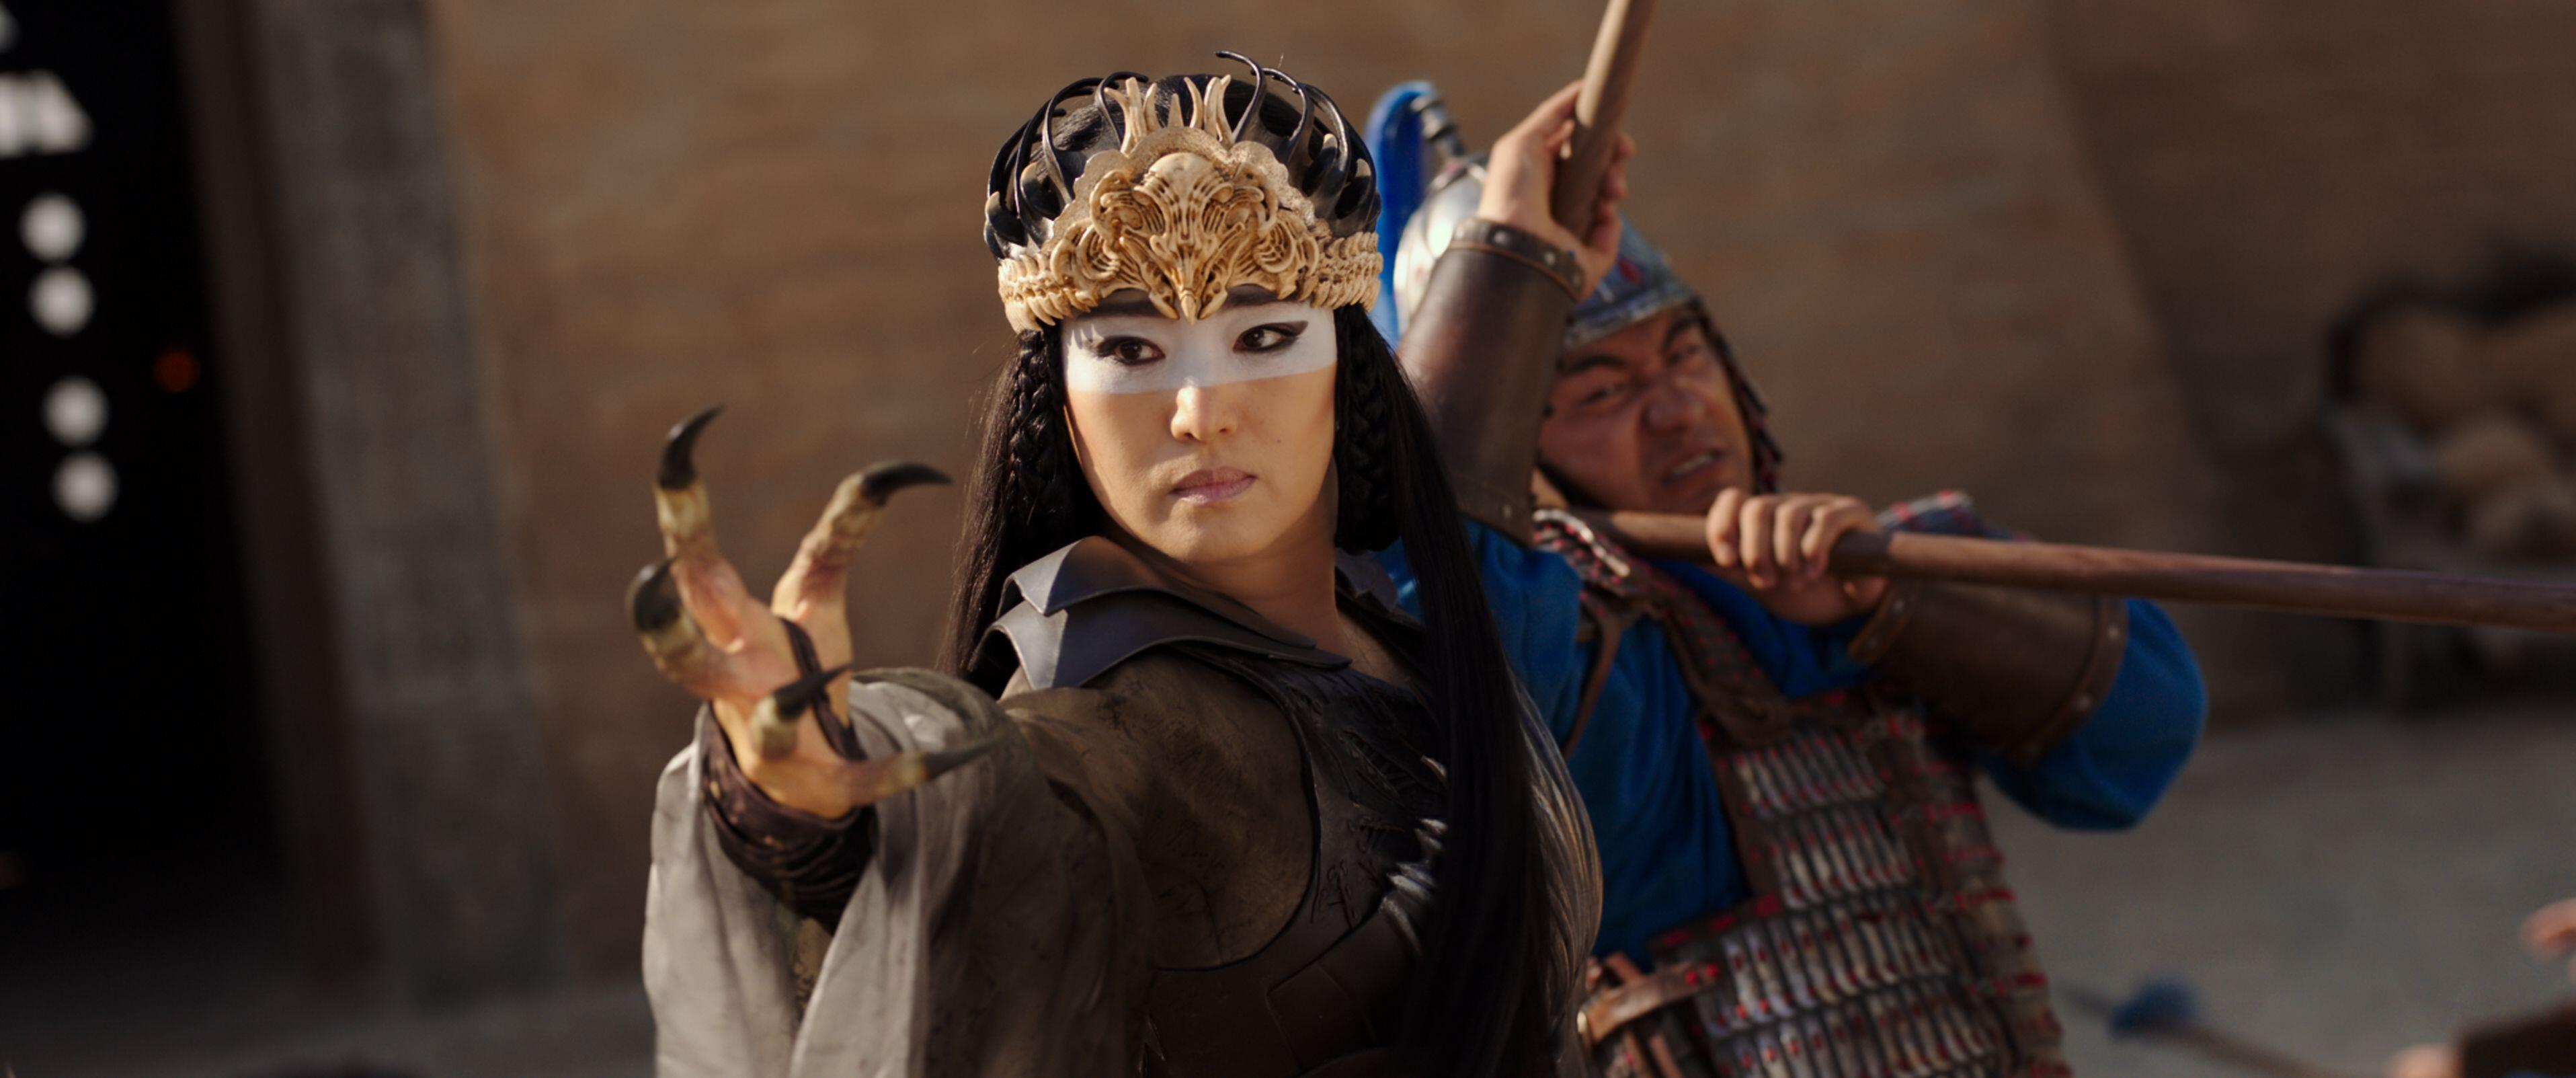 Gong Li è la strega guerriera Xianniang